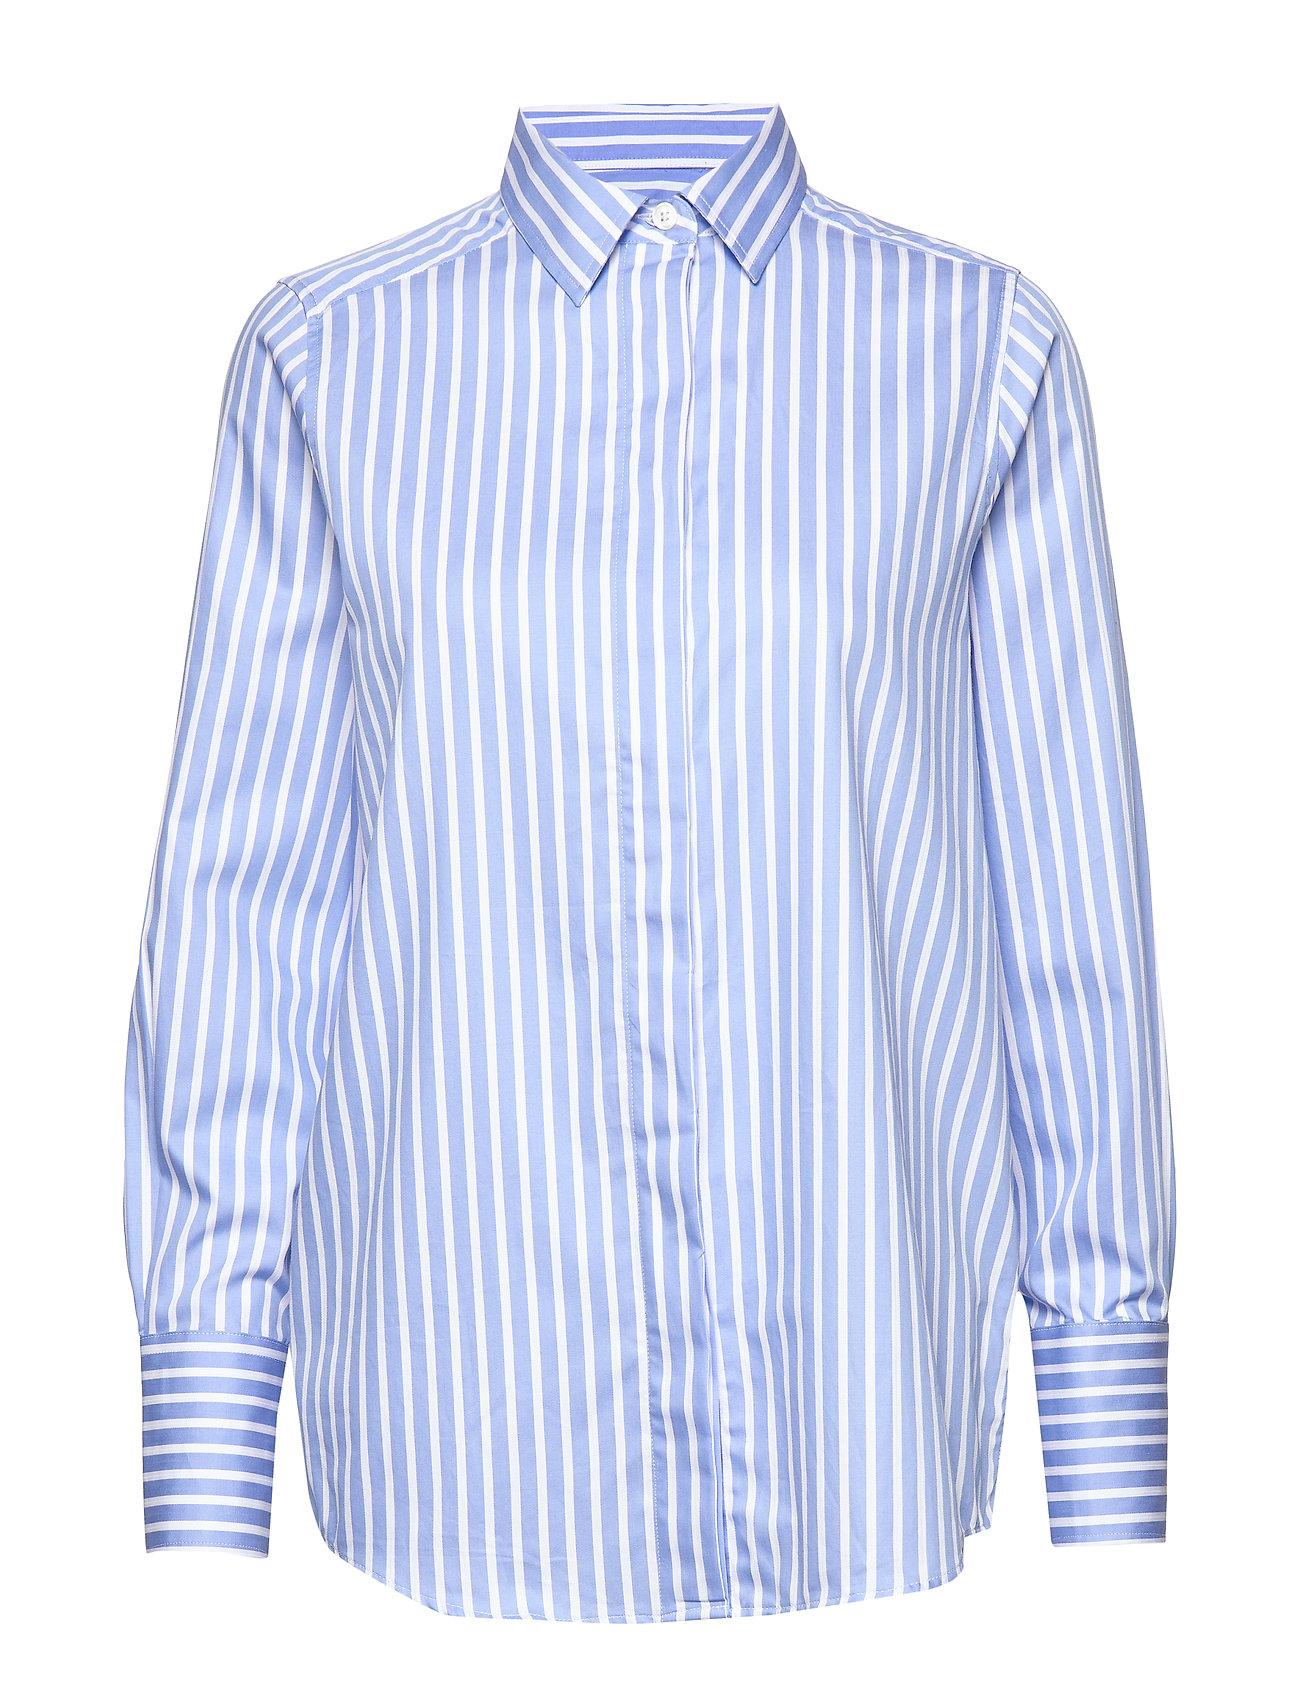 Lexington Clothing Misha Shirt - BLUE/WHITE STRIPE